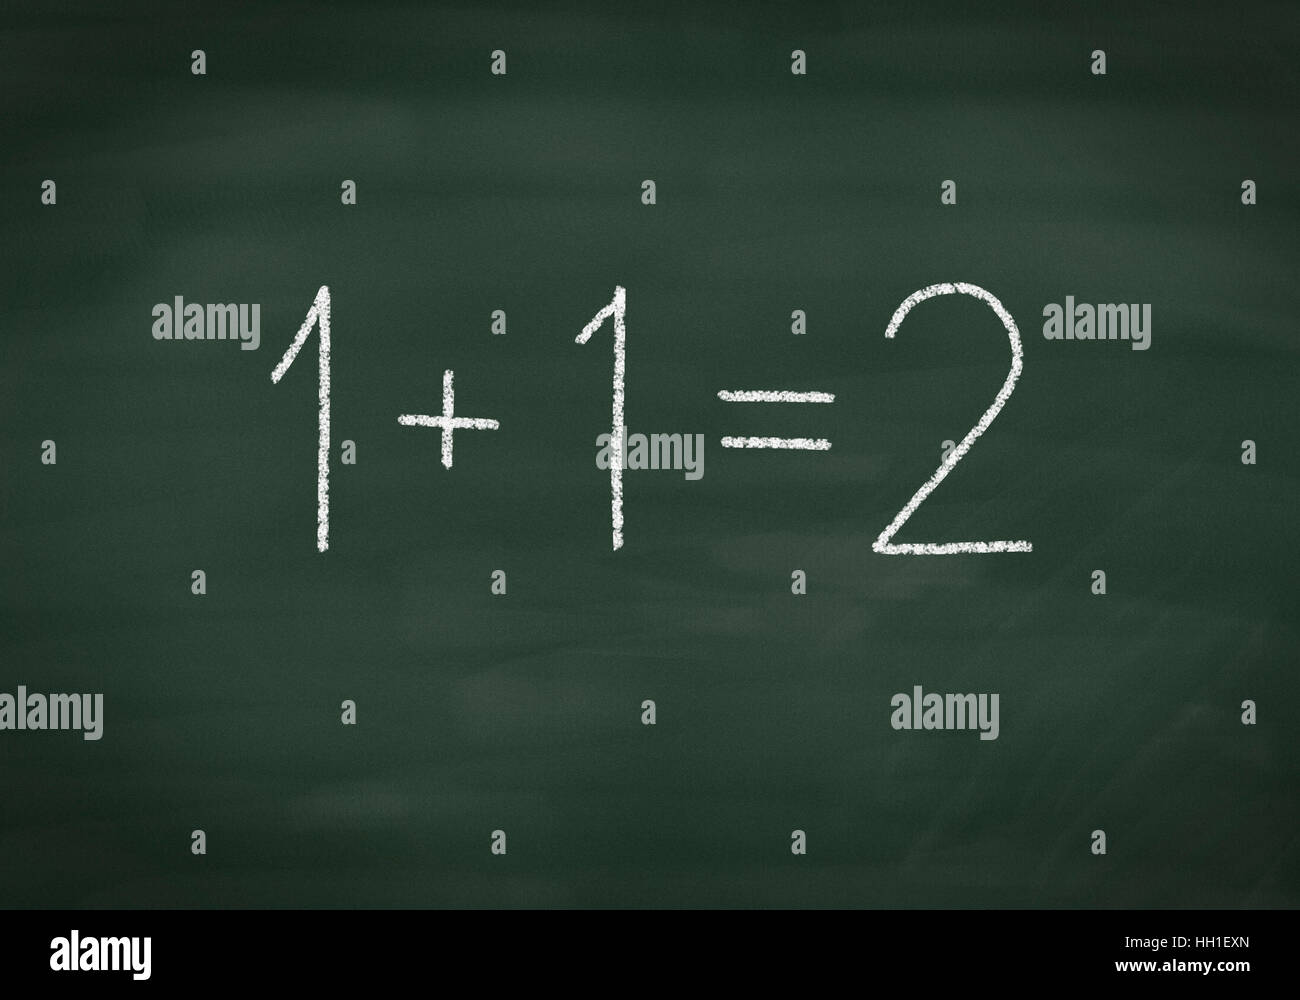 Simple maths on a chalkboard Stock Photo: 130955405 - Alamy